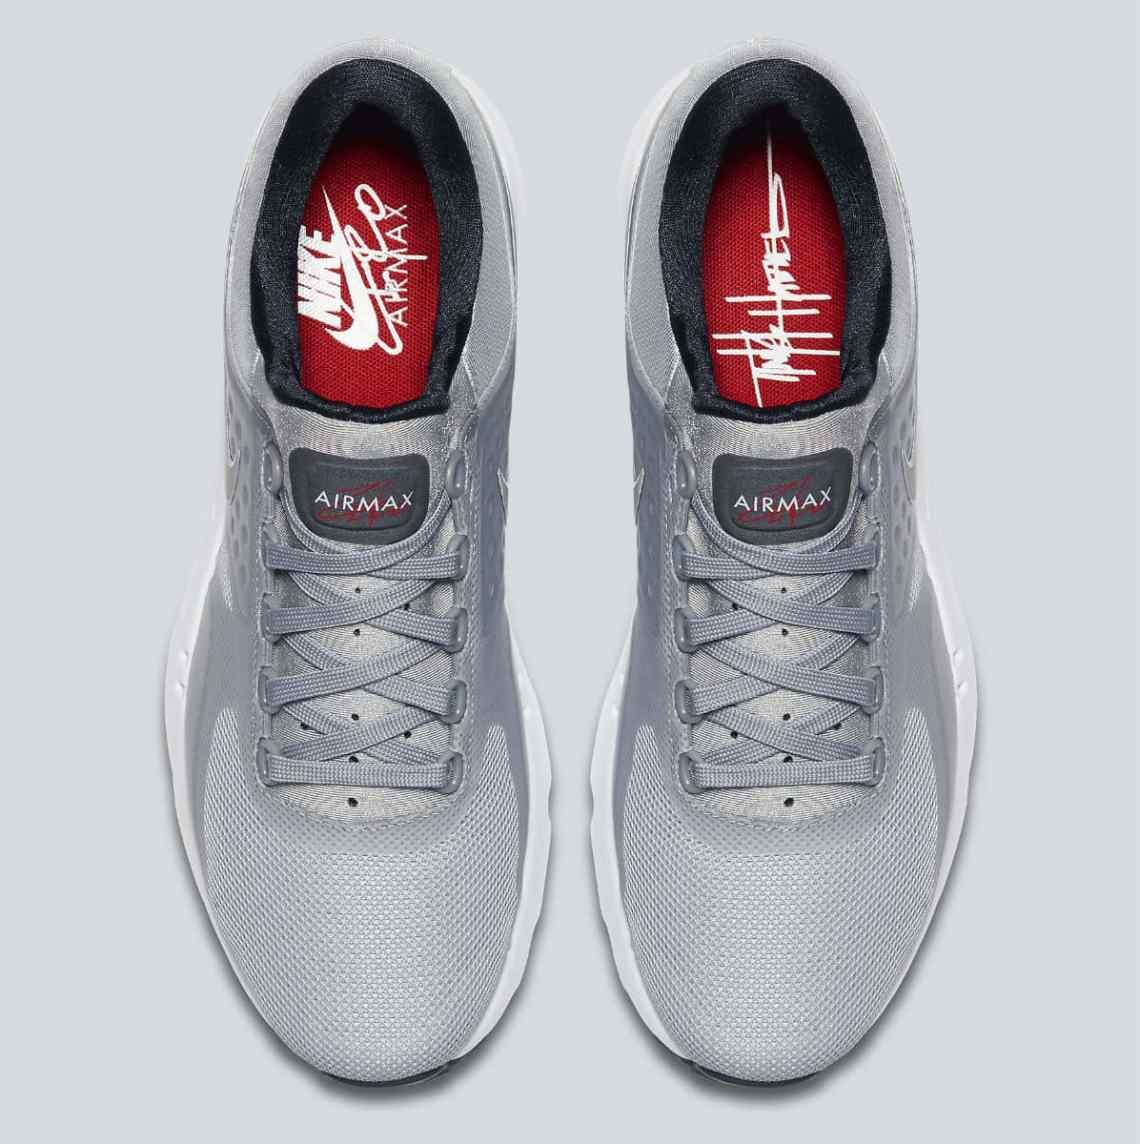 best service 7f7dd adc42 ... Nike Air Max Zero